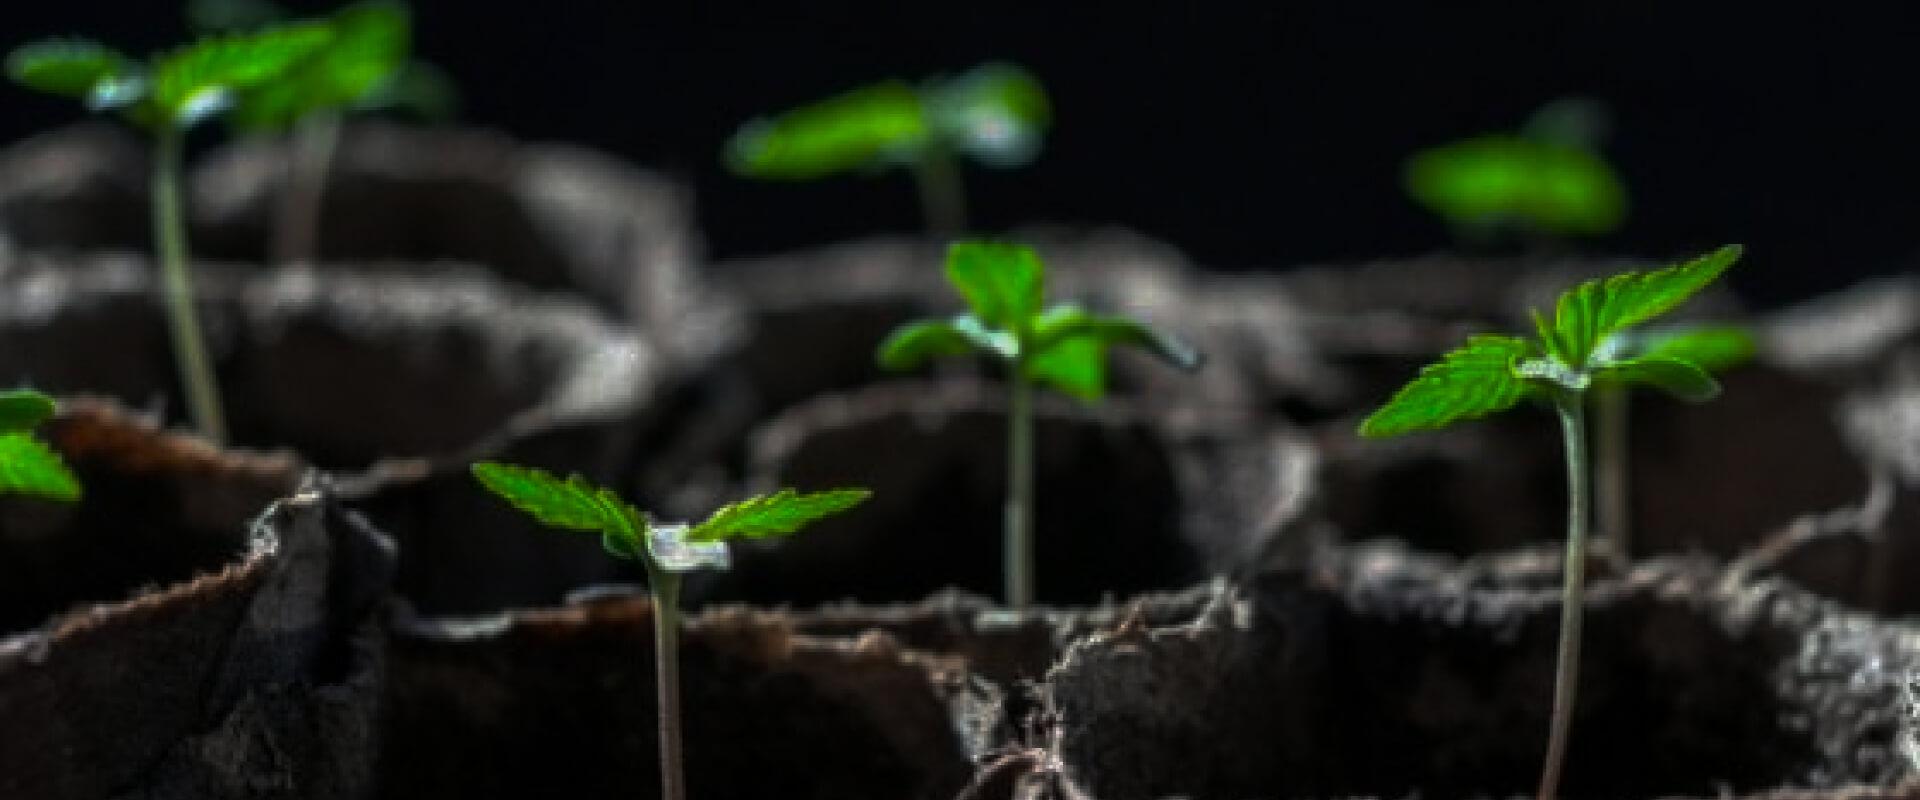 Esquejes de marihuana - Guía completa para sacar clones [2021]